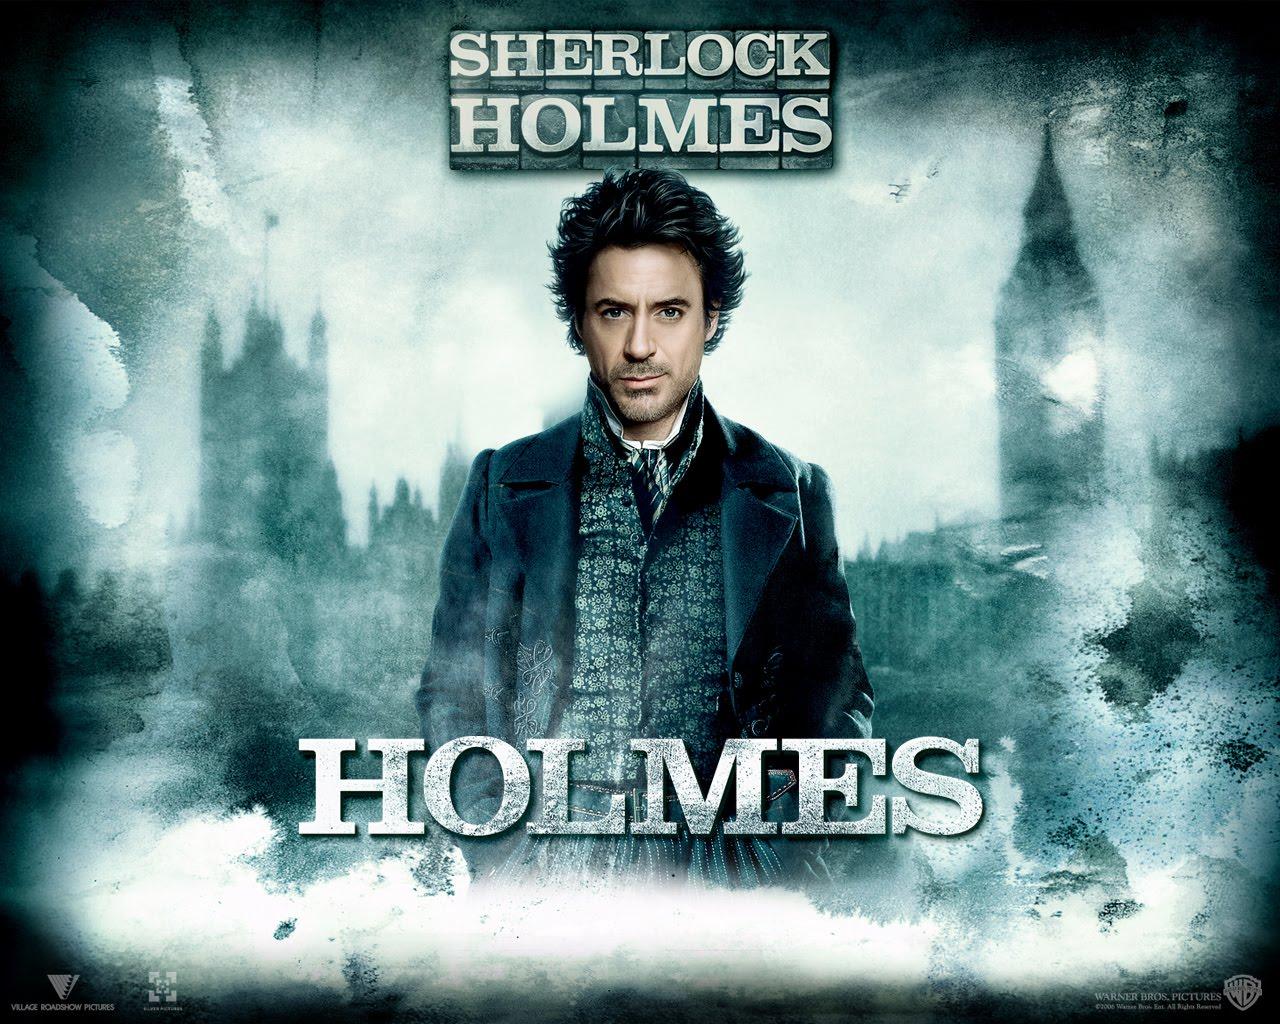 http://2.bp.blogspot.com/_ONm5NuaUSHk/S8AX0E5X8iI/AAAAAAAAAMI/aEF0_Riv2Qk/s1600/Robert_Downey_Jr._in_Sherlock_Holmes_Wallpaper_1_1280.jpg